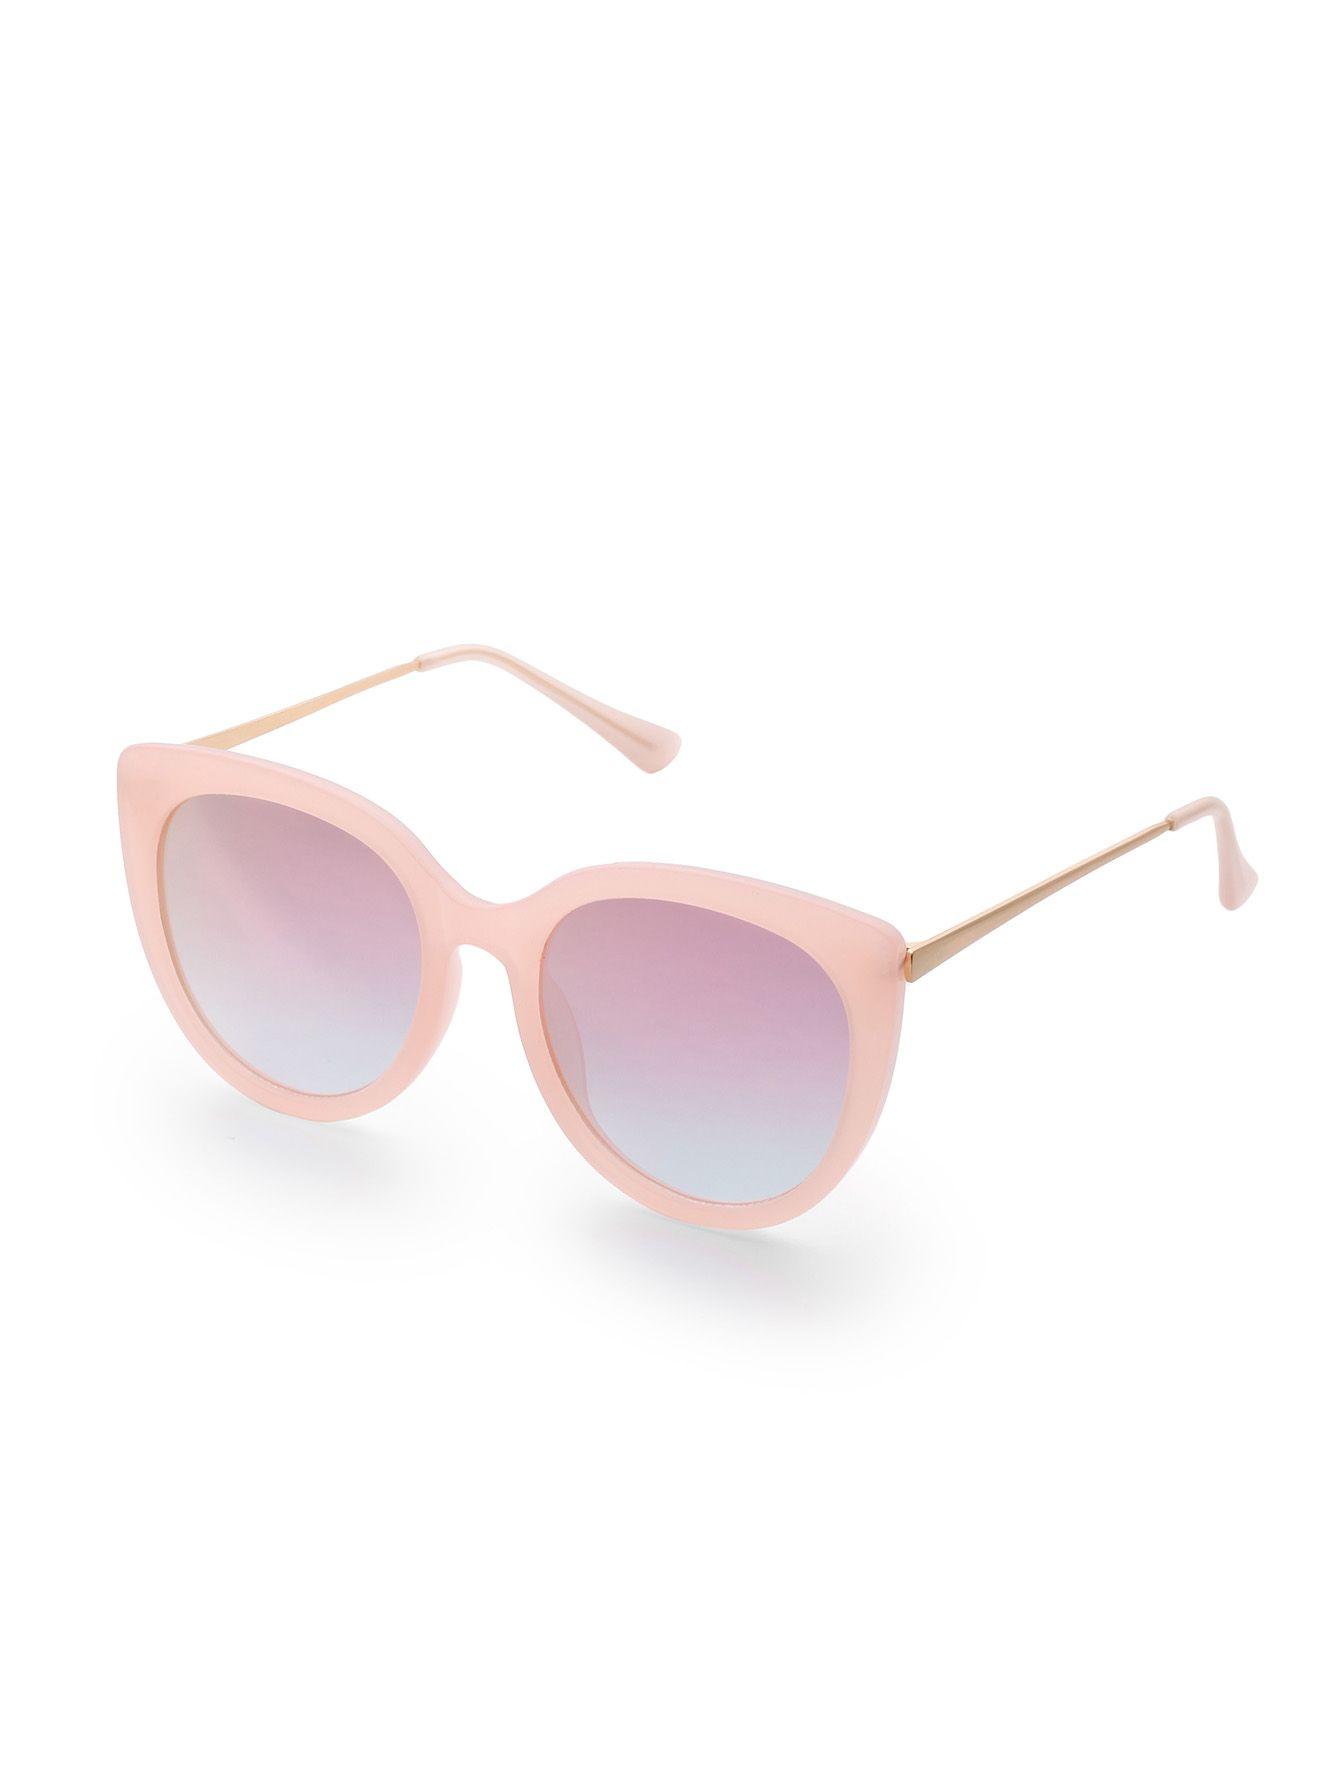 Gafas de sol estilo ojo de gato con lentes rosas-(Sheinside)  aa9dff95589d